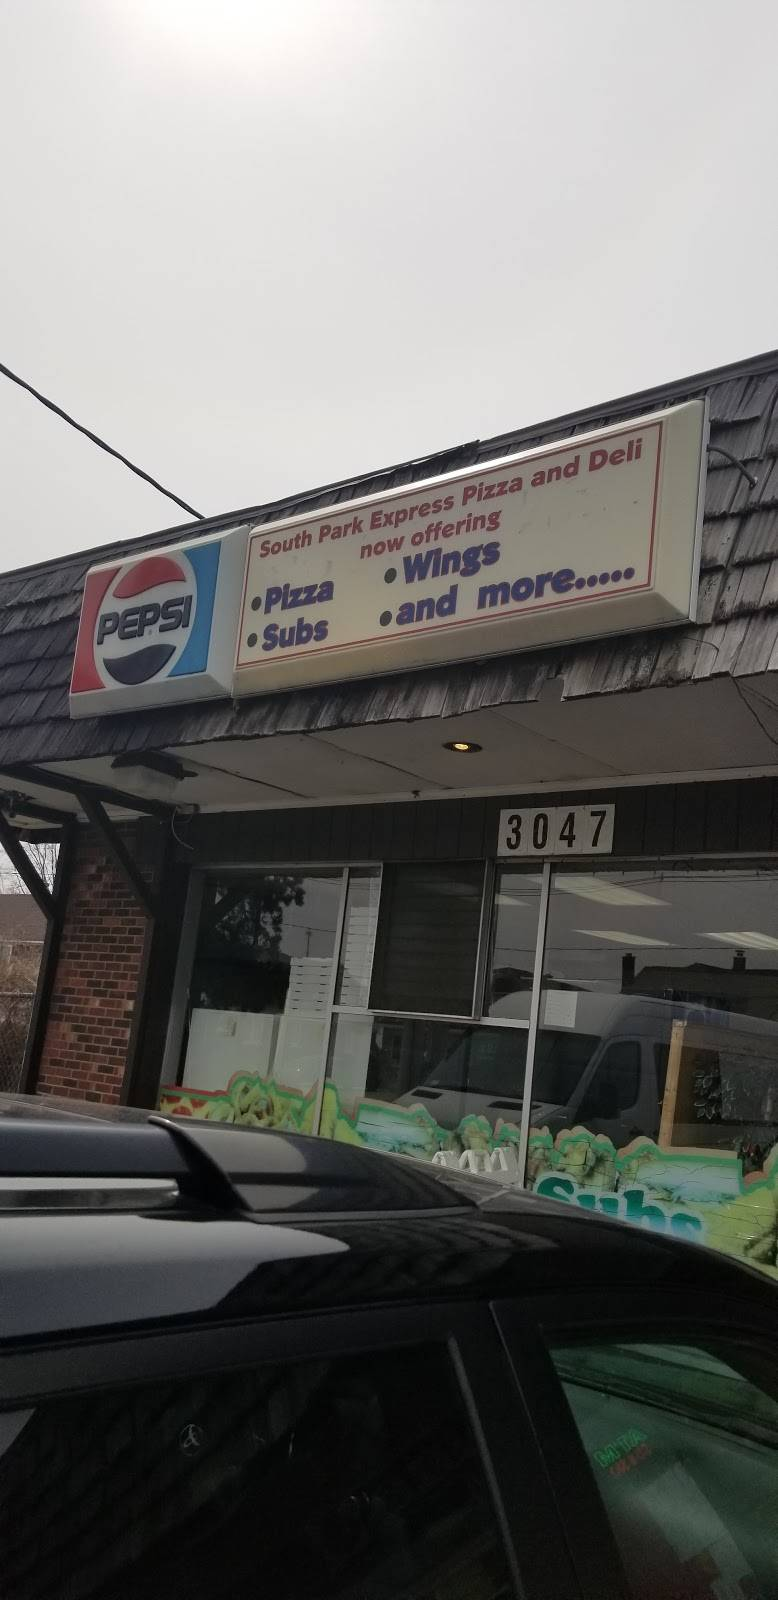 South Park Express Pizza And Deli مطعم حضرموت - restaurant    Photo 9 of 9   Address: 3045 South Park Ave, Lackawanna, NY 14218, USA   Phone: (716) 826-8800